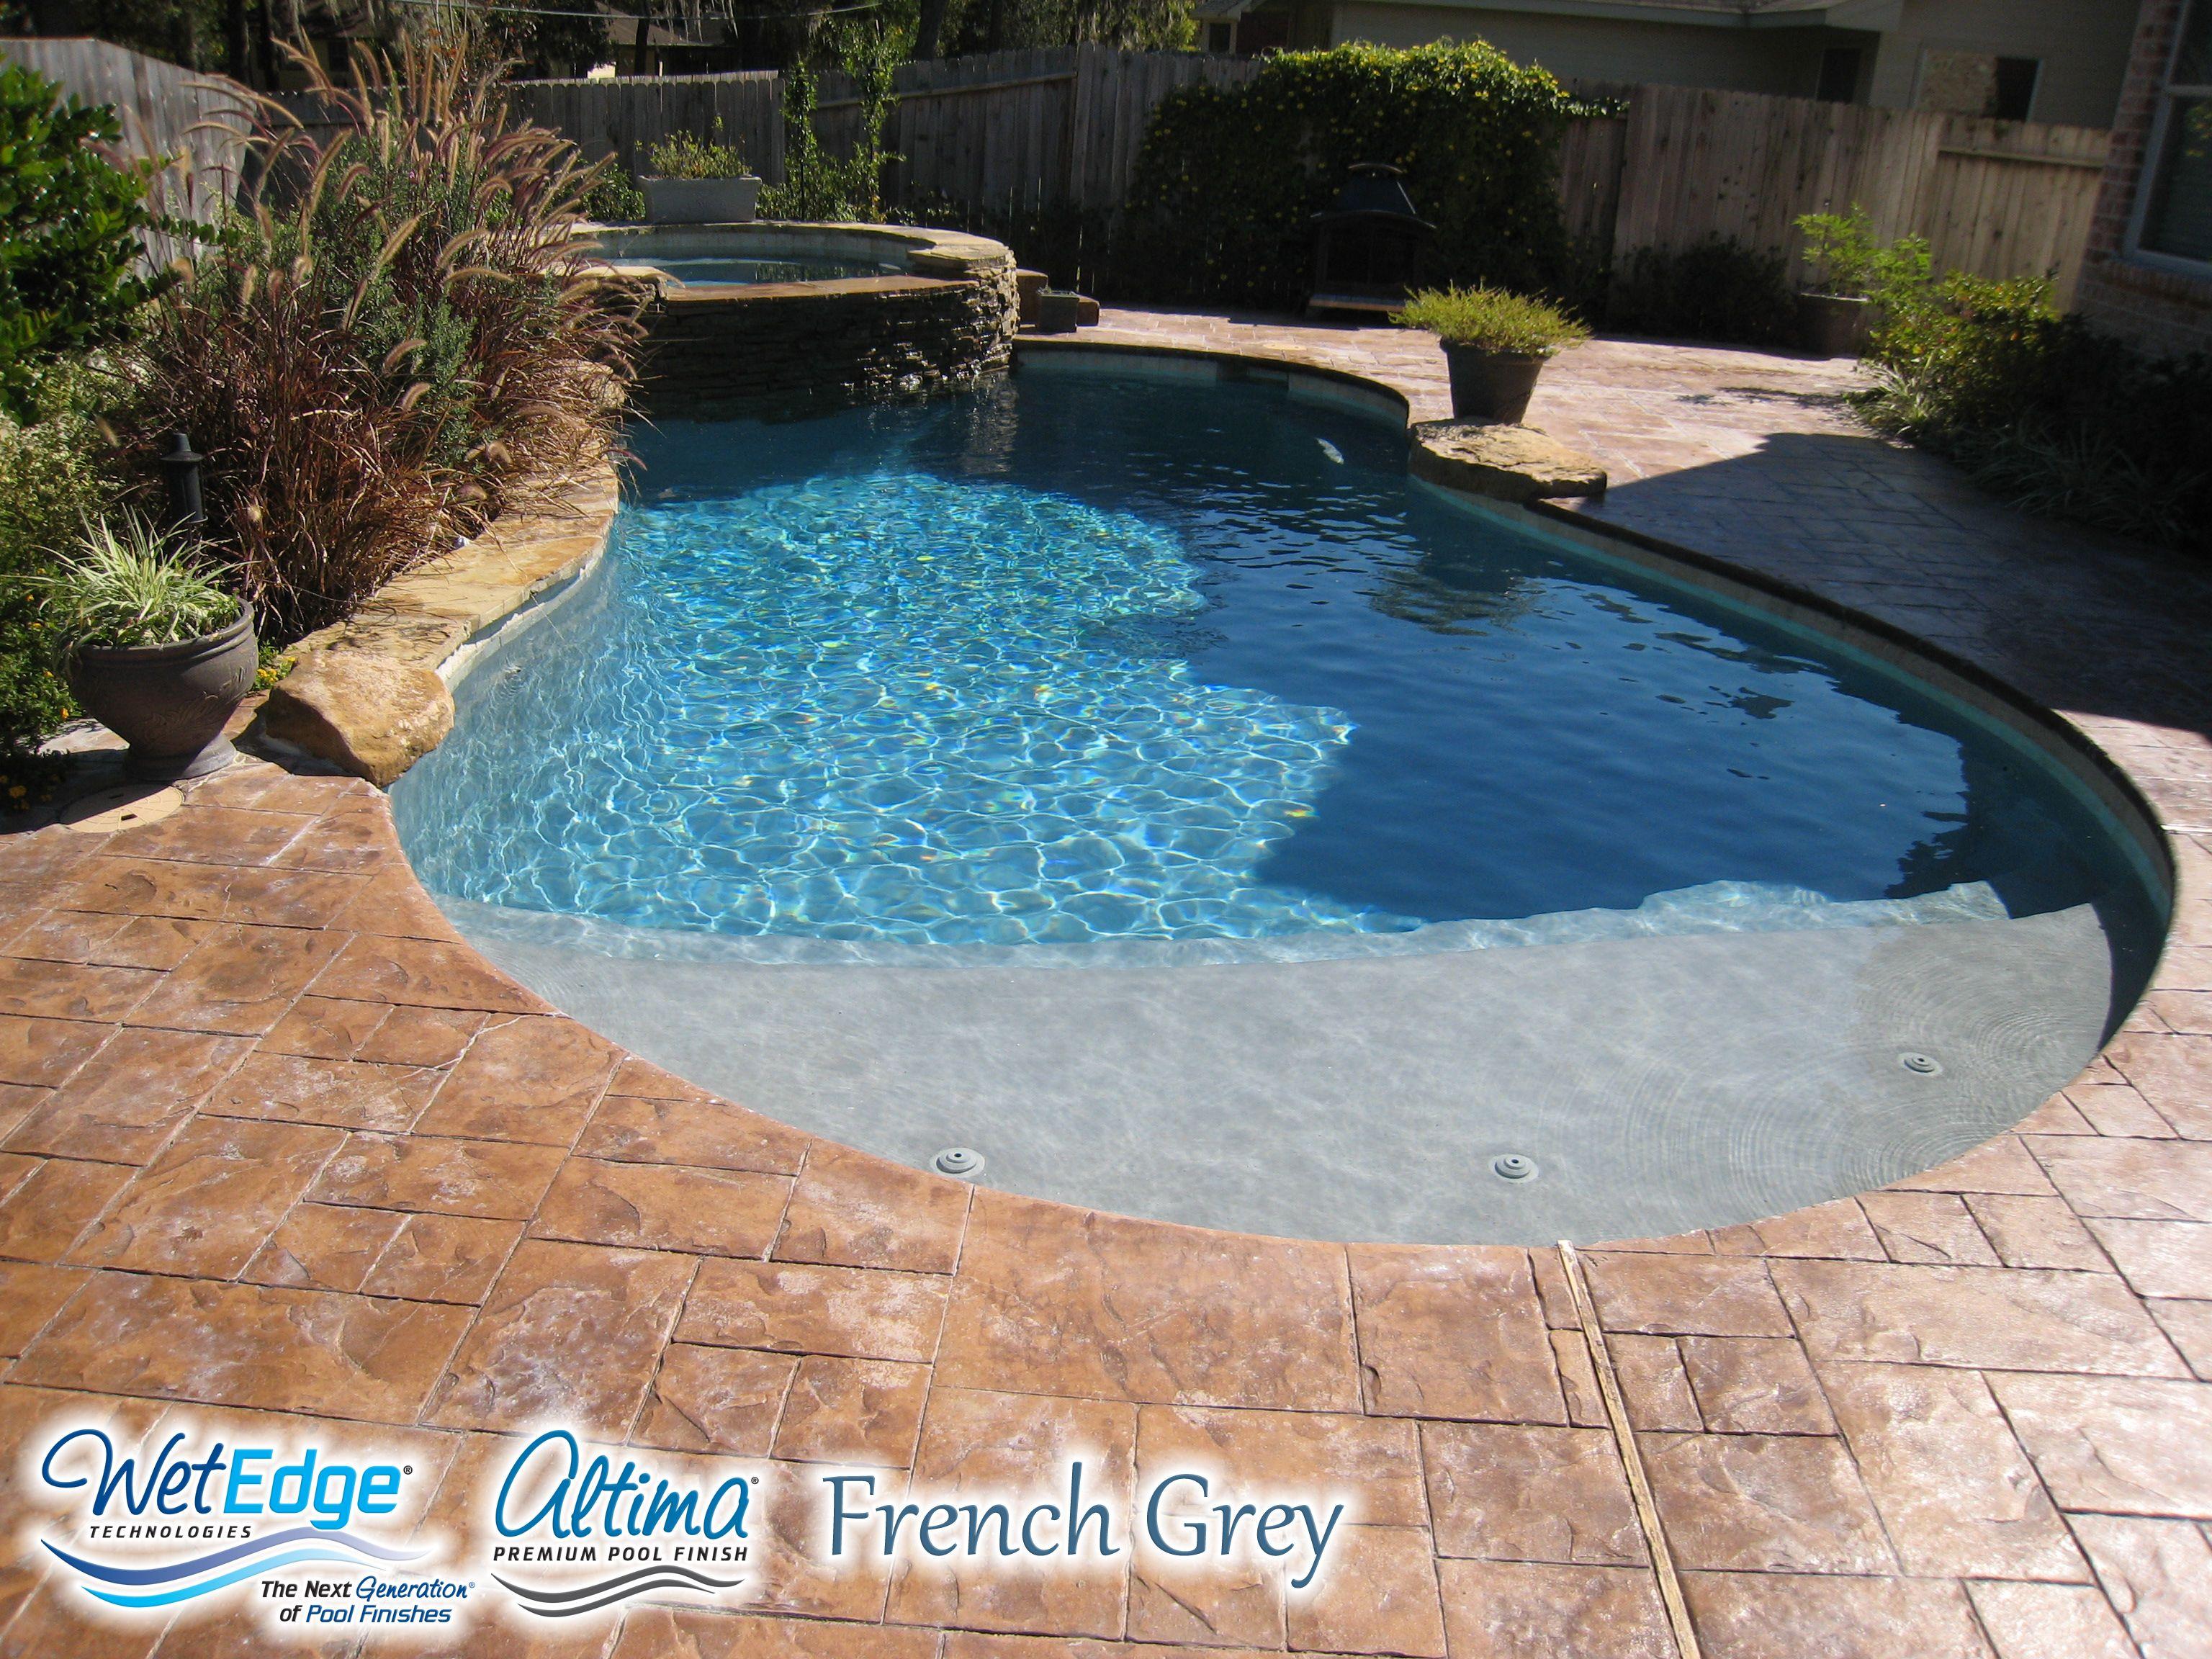 Altima French Grey Pool Plaster Steps White Quartz